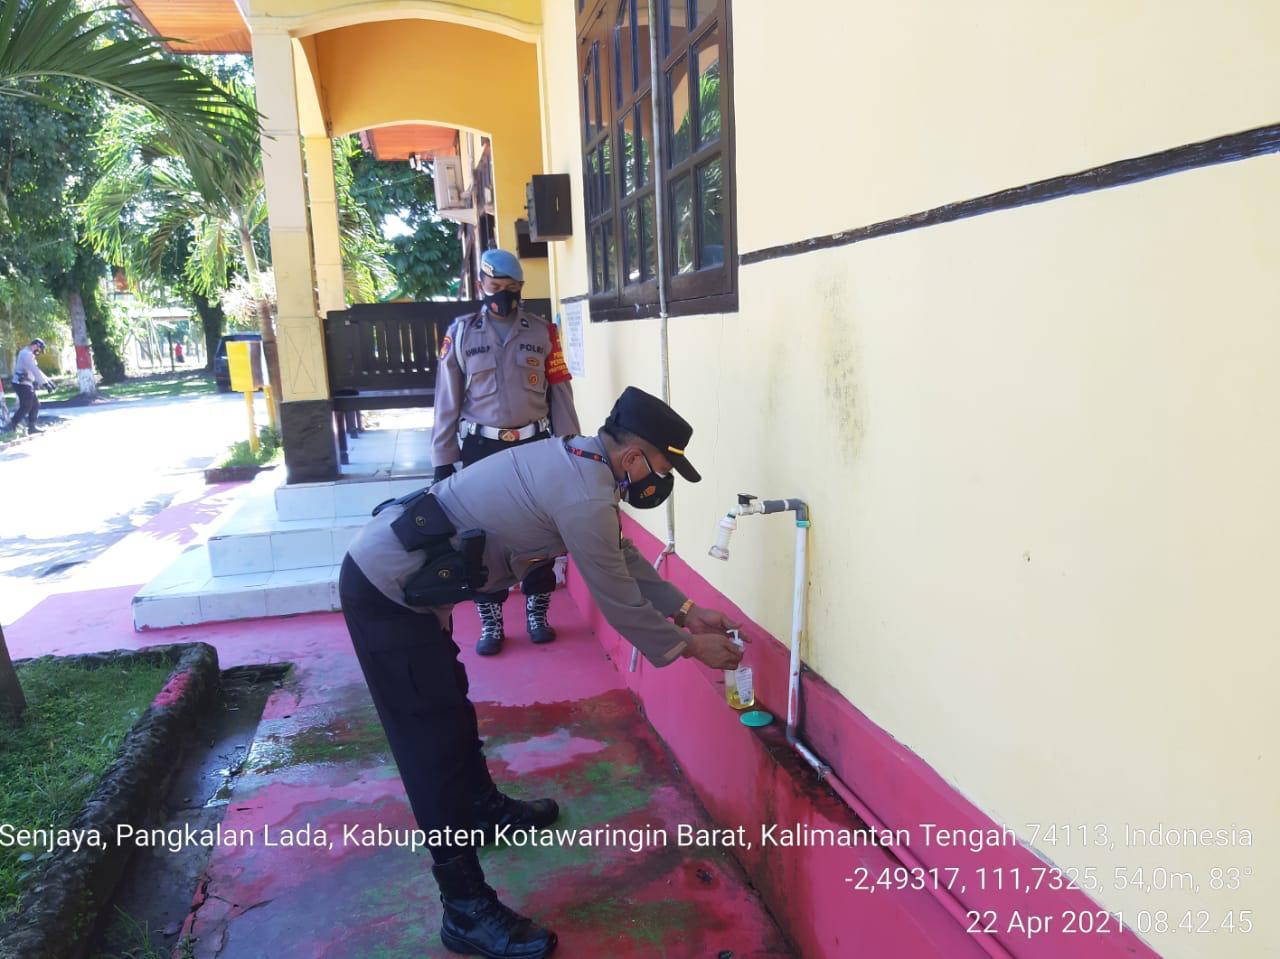 Pastikan Ibadah Berjalan Kondusif, Aipda Dharma Lakukan Pengamanan Sholat Tarawih Di Masjid Nurul Qolbi